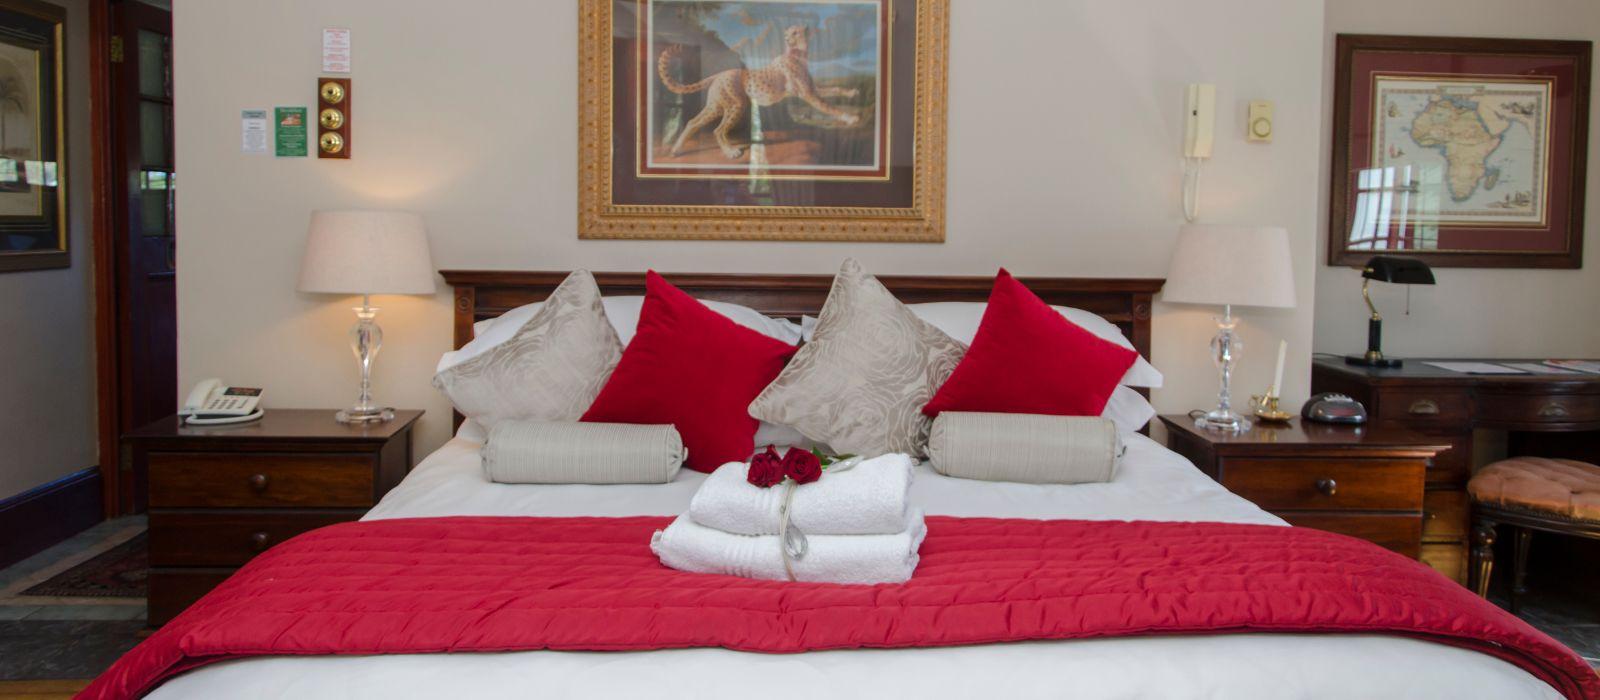 Hotel Brighton Lodge South Africa